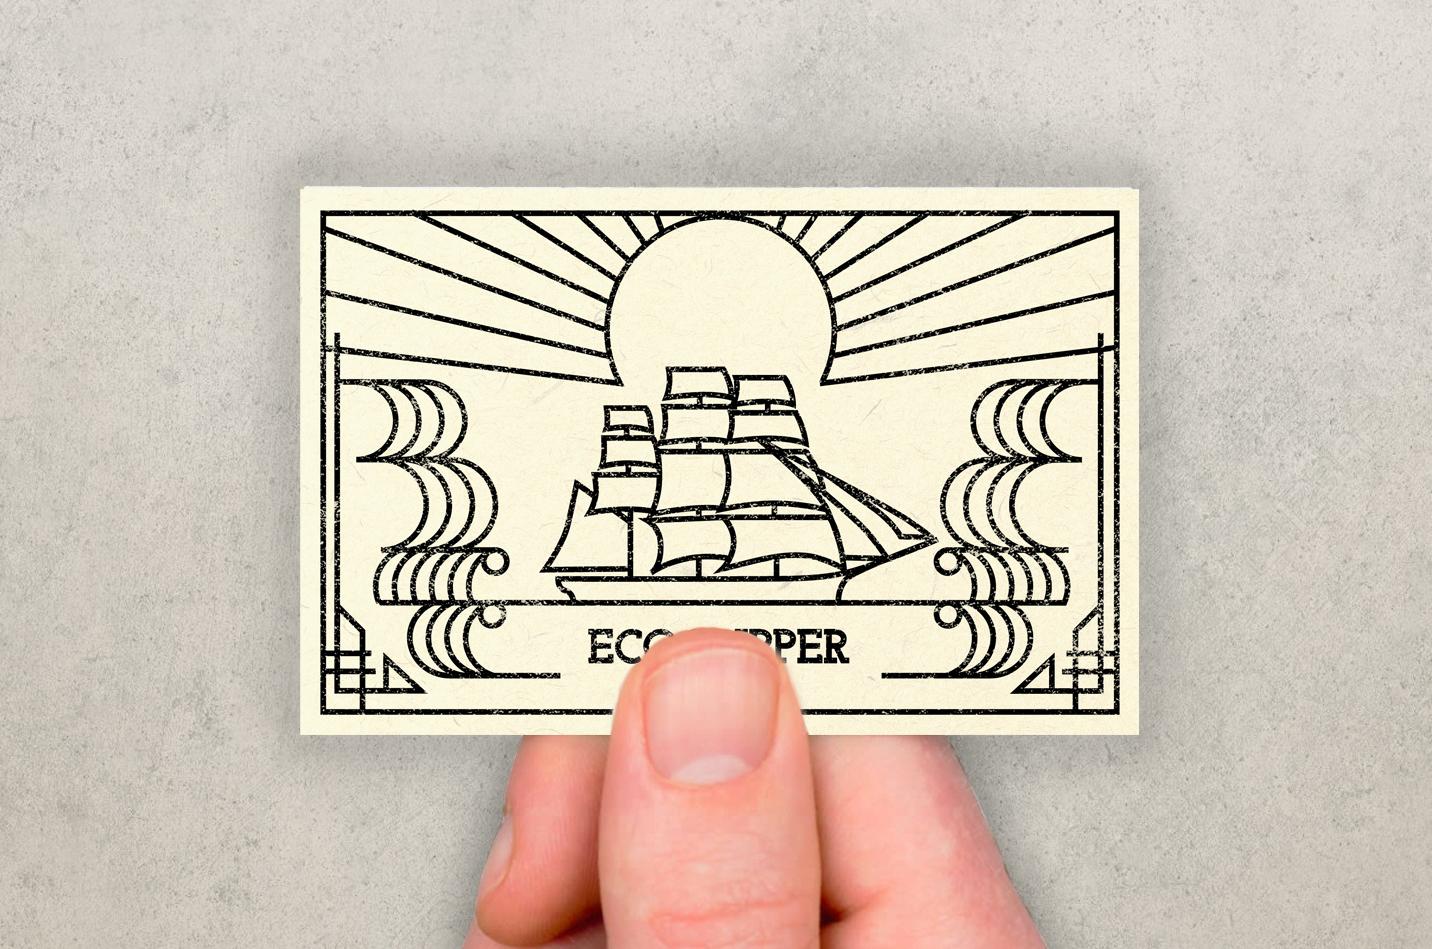 190215-logoecoclipper2.jpg